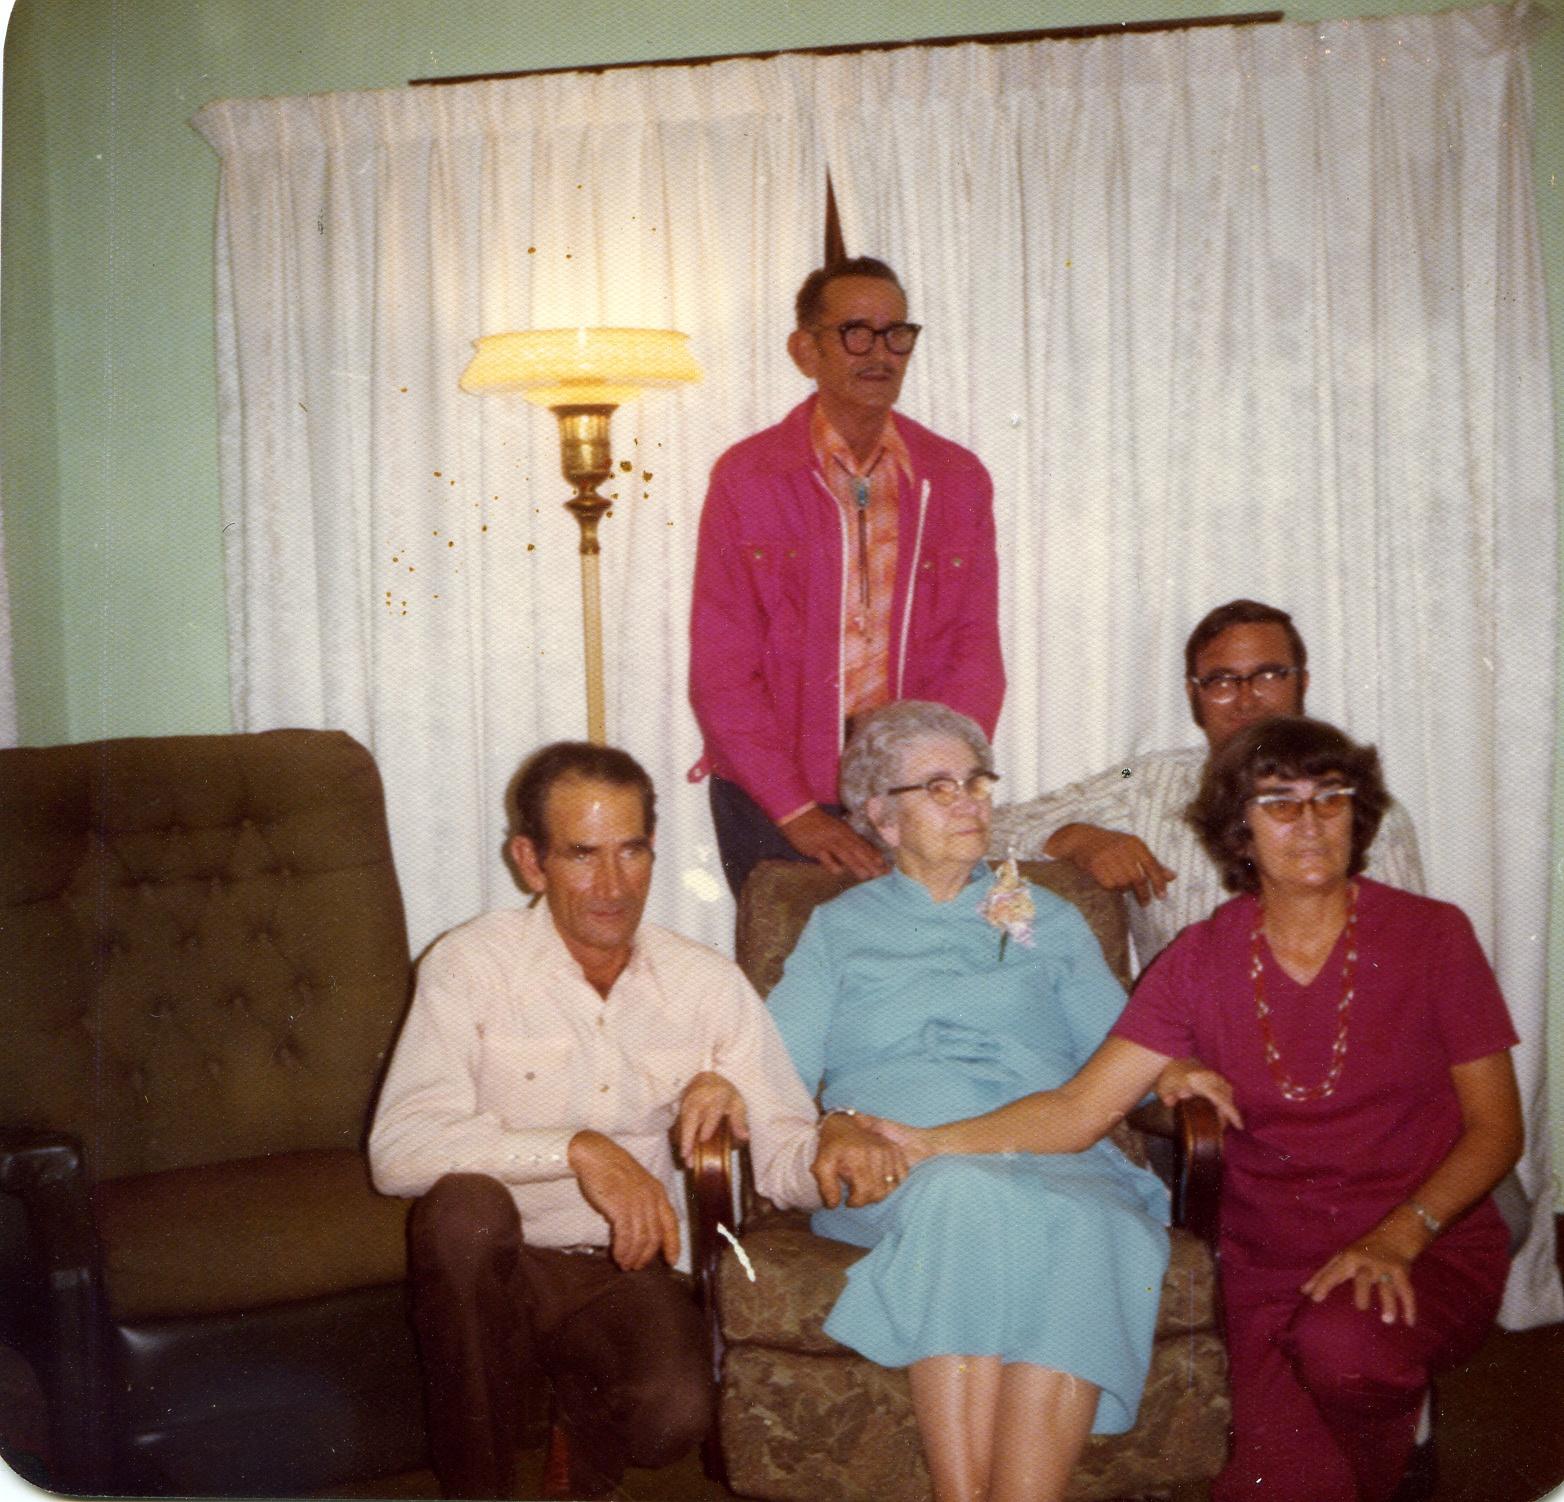 claraashcroftfoutzfamily033